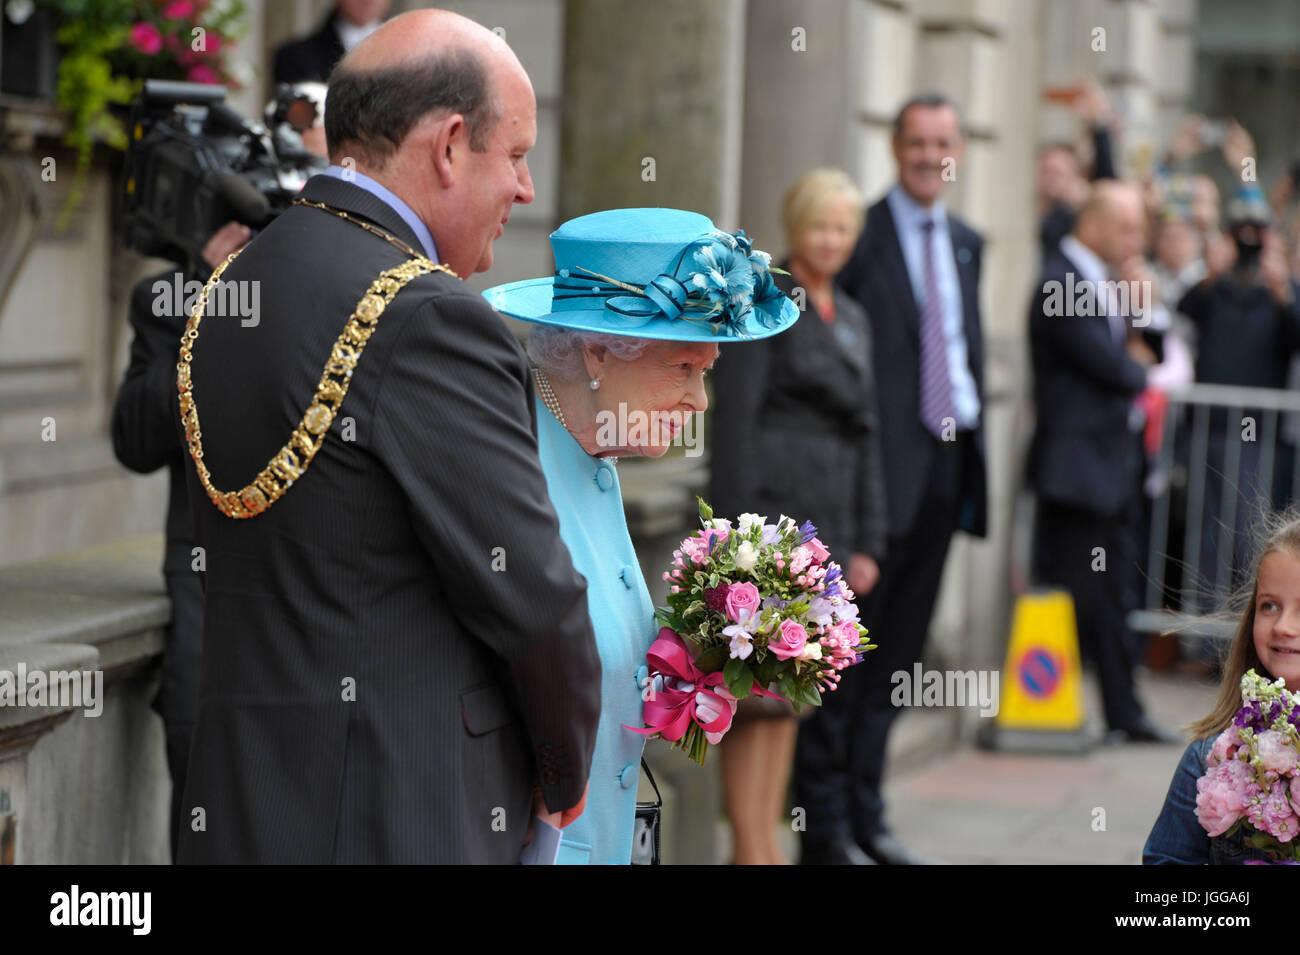 Edimburgo, Reino Unido. 07 de julio, 2017. La Reina visita la Real Sociedad de Edimburgo en George Street. Crédito: Imagen De Stock